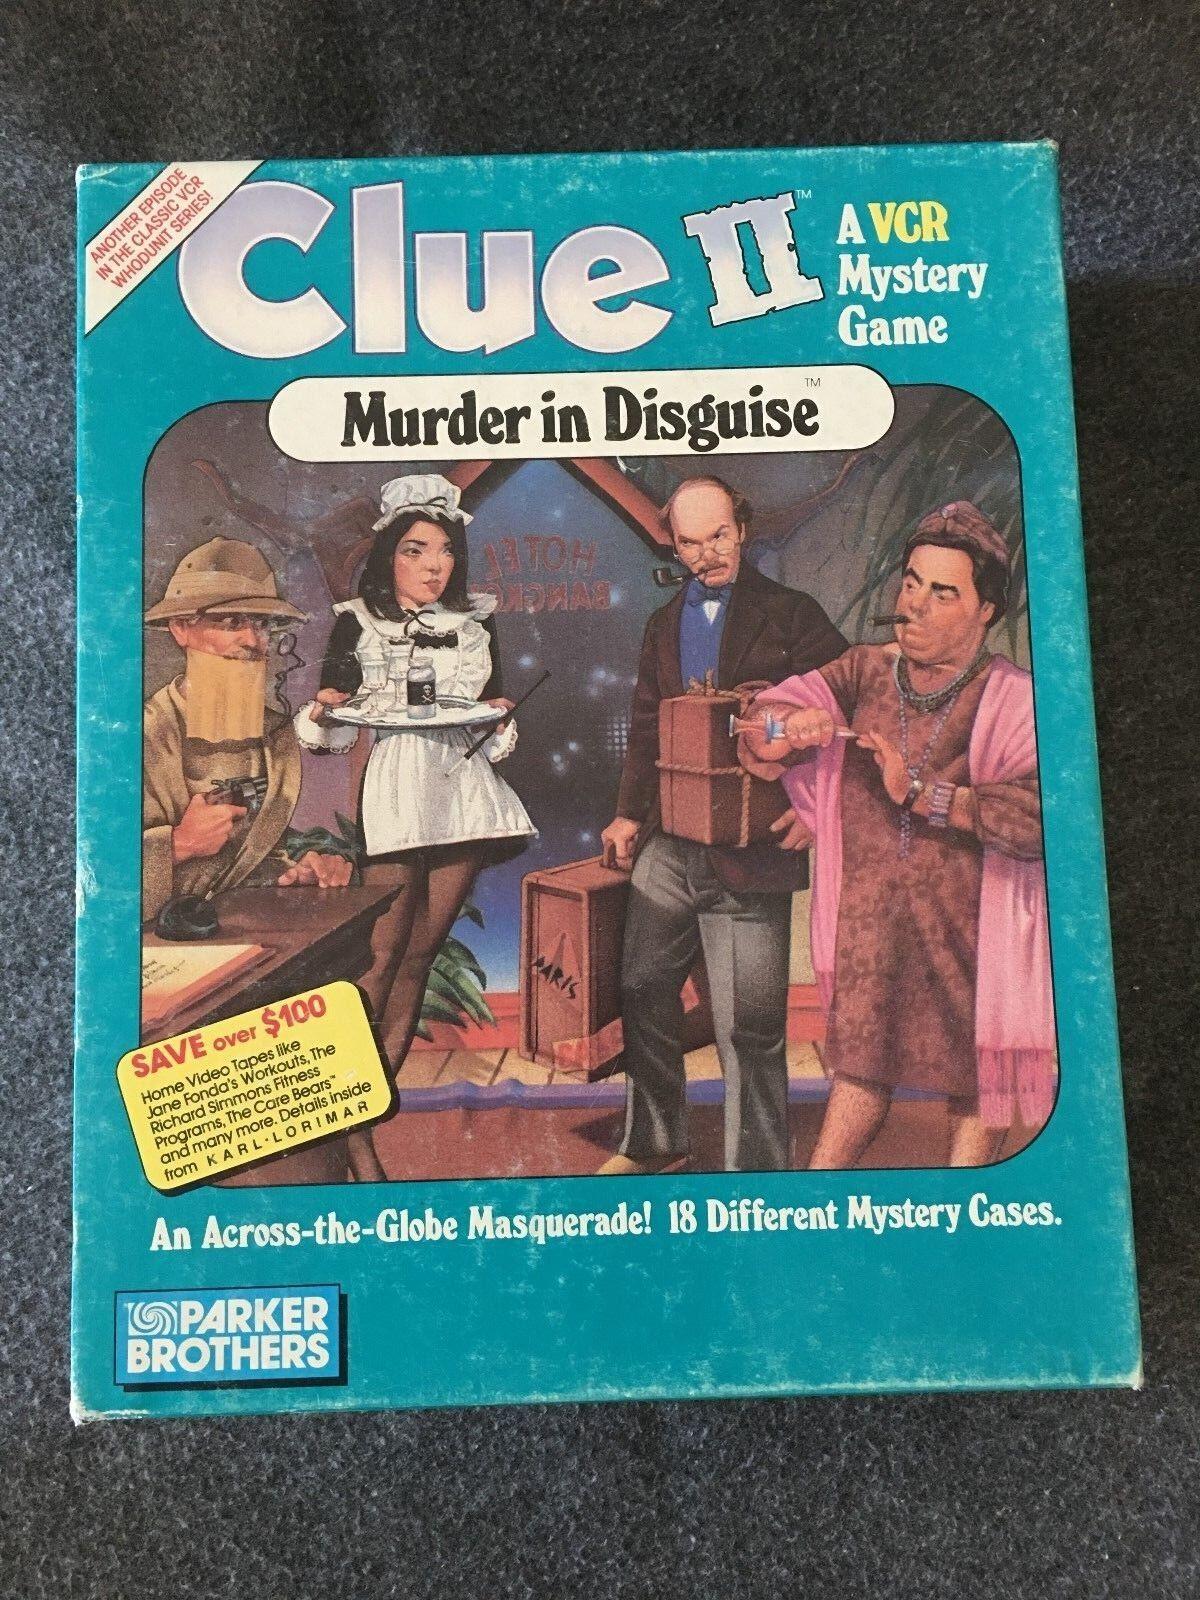 Pista 2 asesinato in Disguise VCR juego 1987 Coleccionable